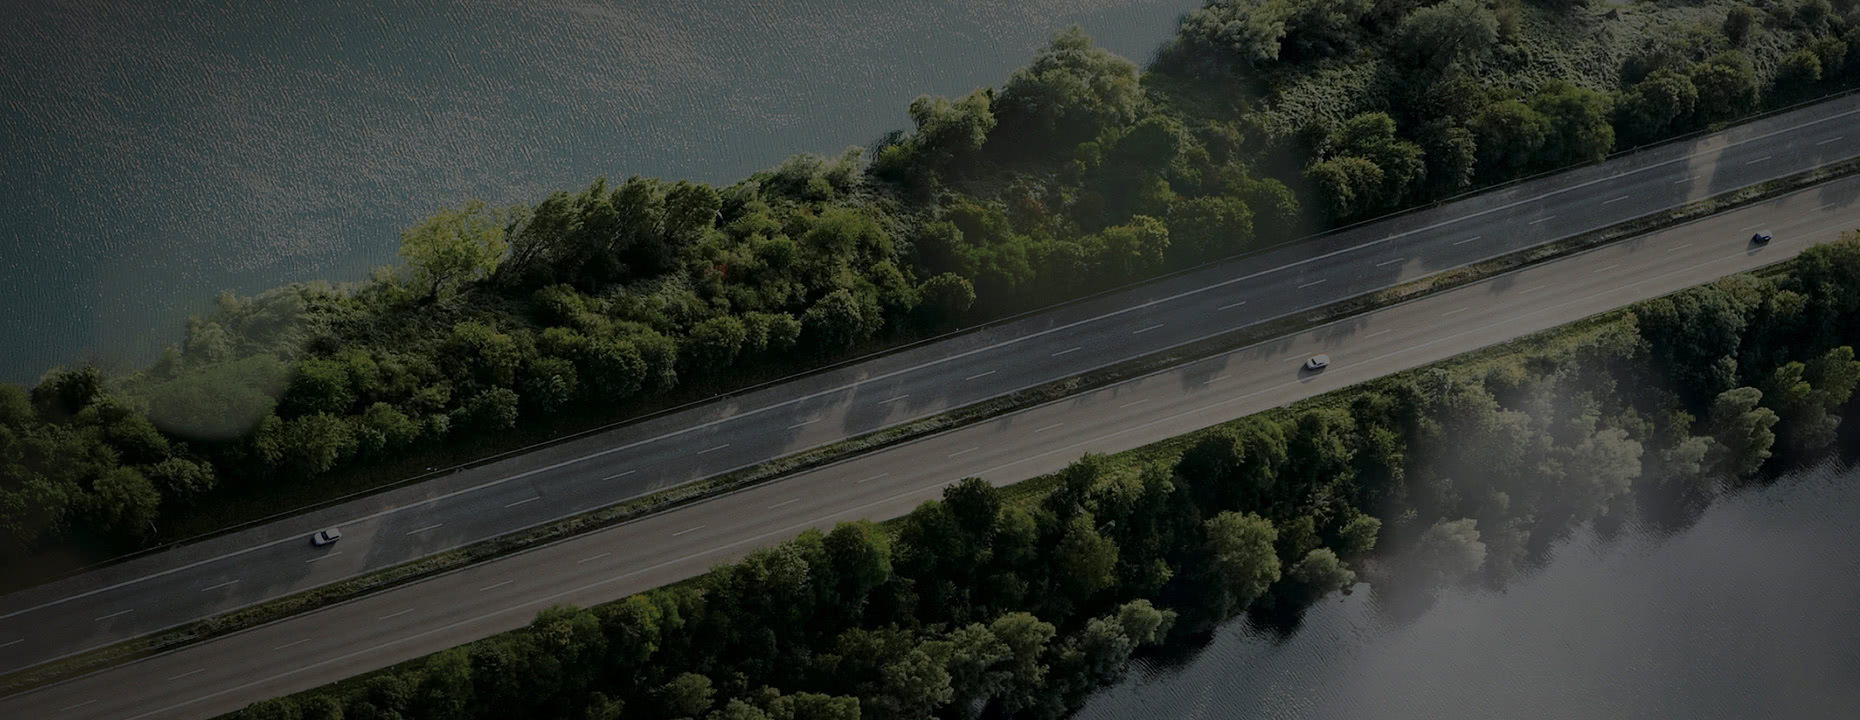 Тест-драйв Hyundai Elantra 2019 FL: останній писк корейського дизайну | Дар-Авто - фото 17